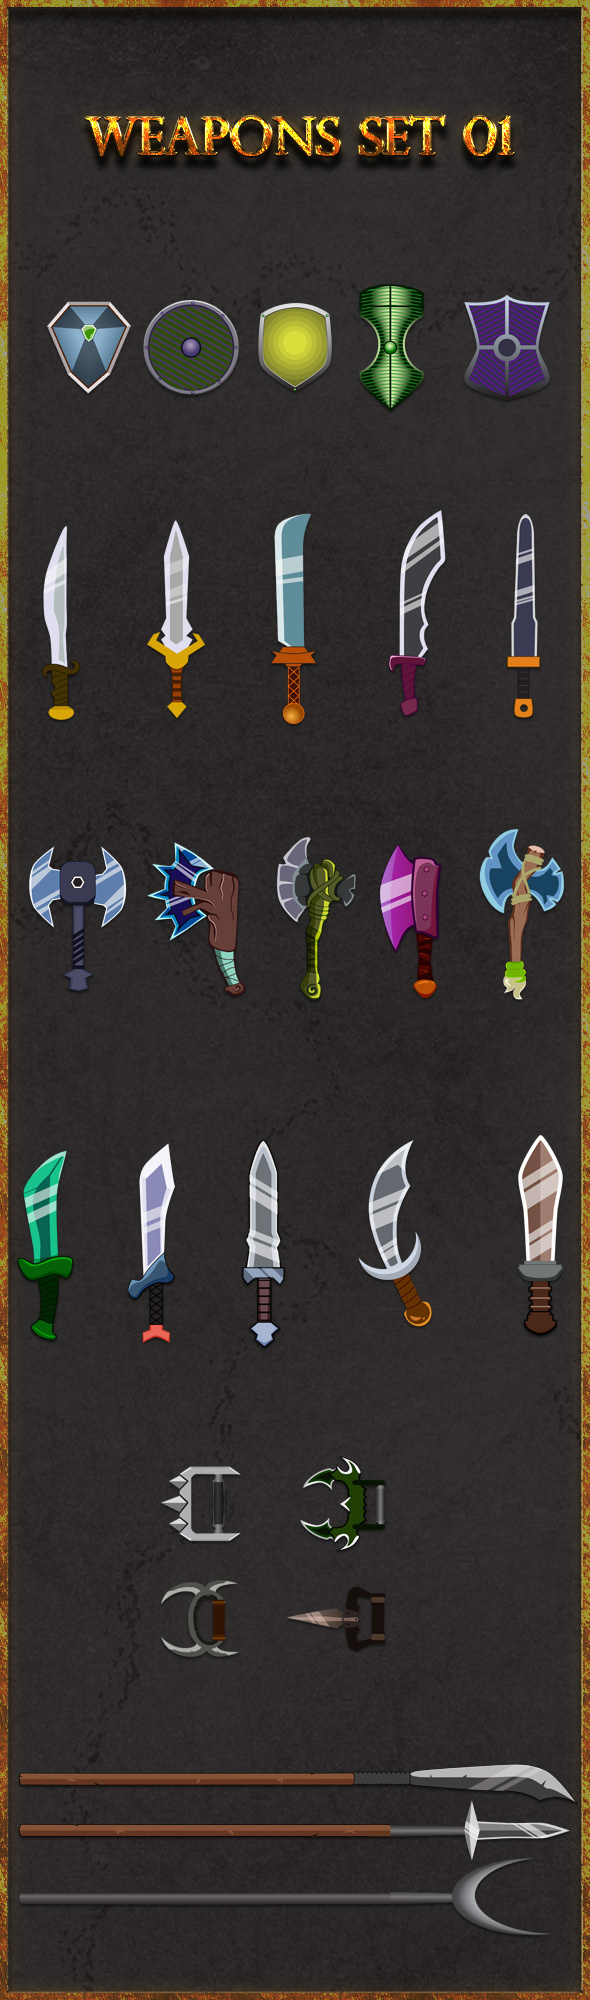 adventure Ancient axe battle Blade Combat cross dagger equipment fantasy